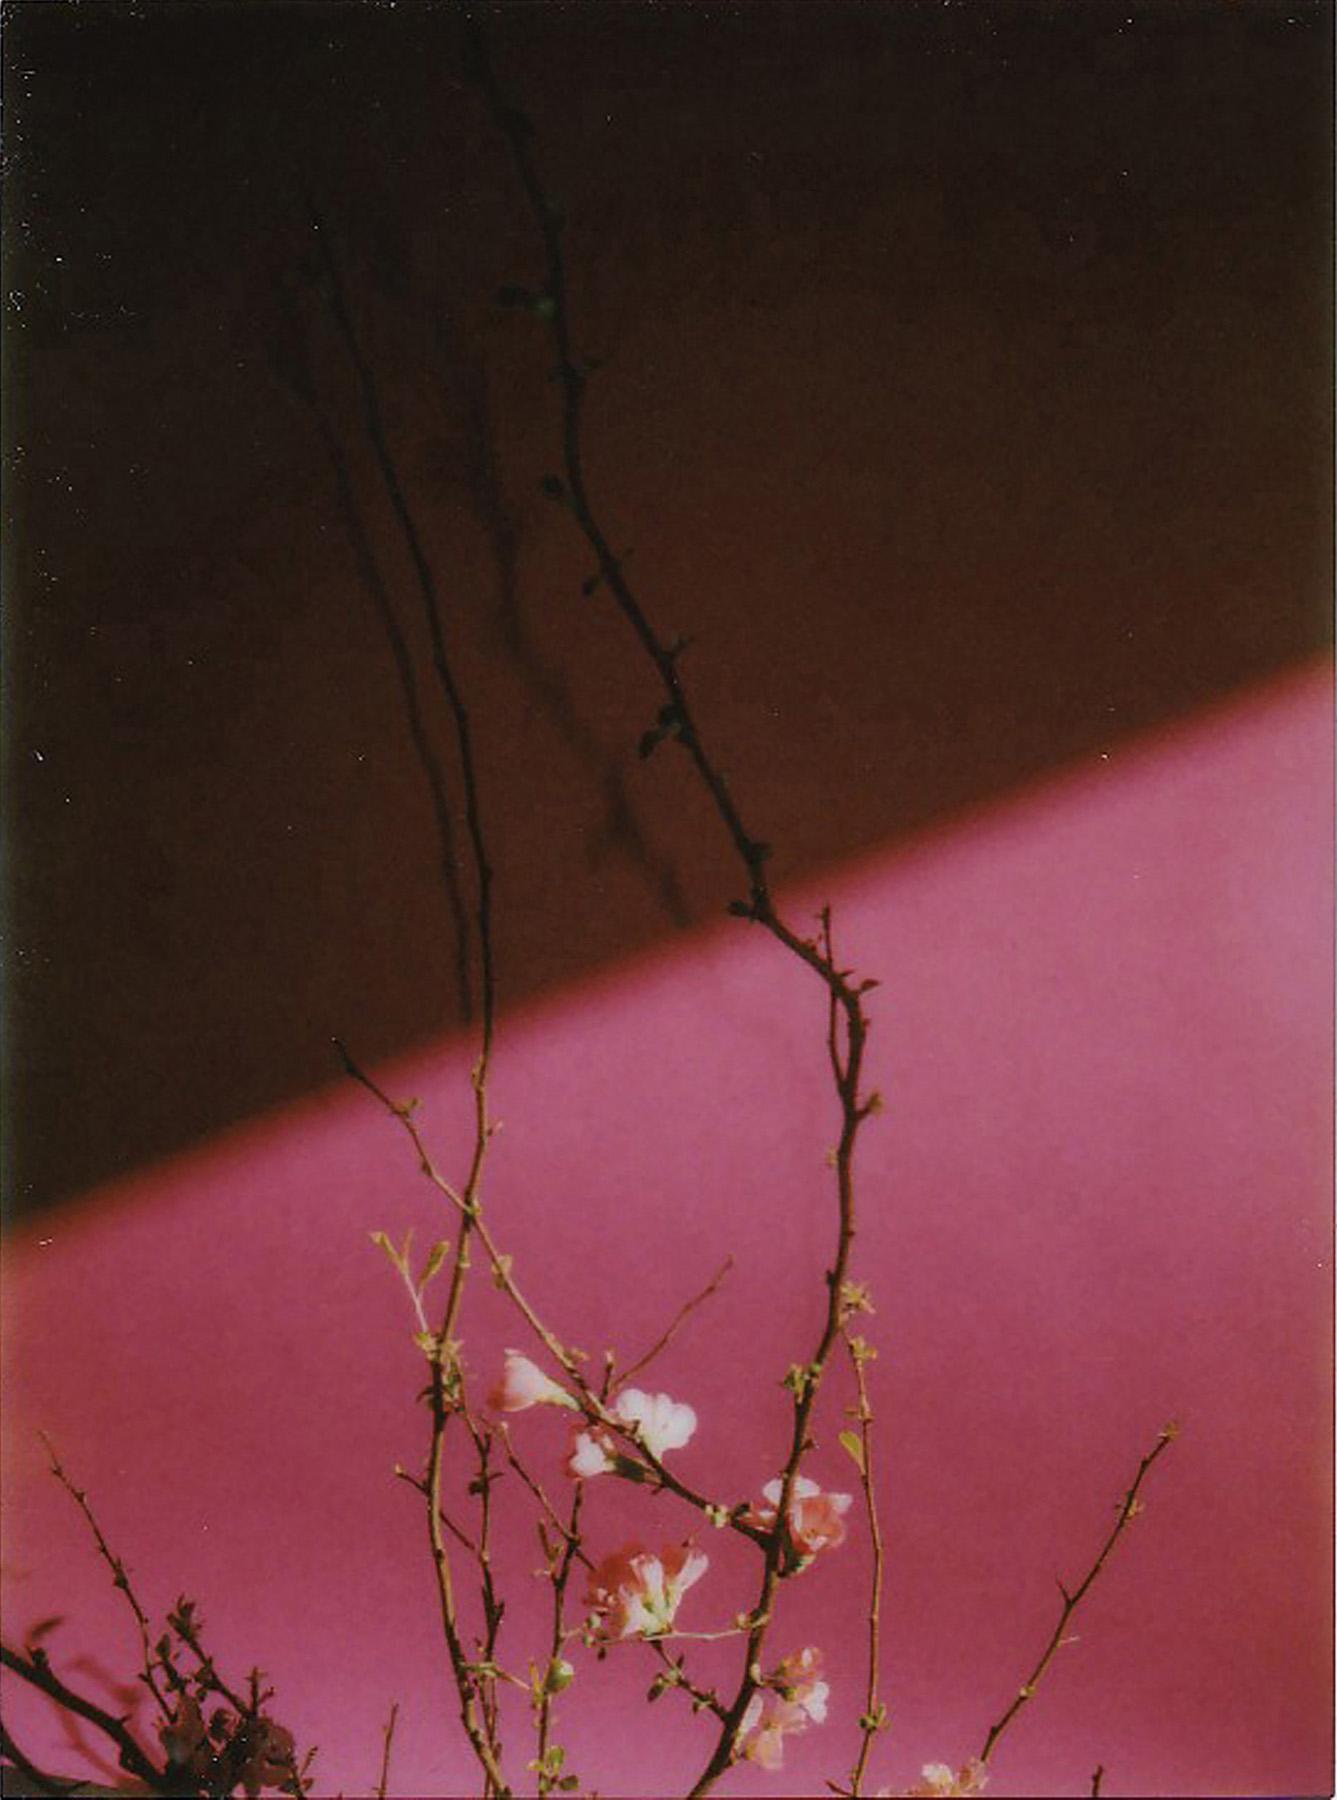 036-icon-artist-management-Kristin-Vicari-Girls and Flowers-36.jpg